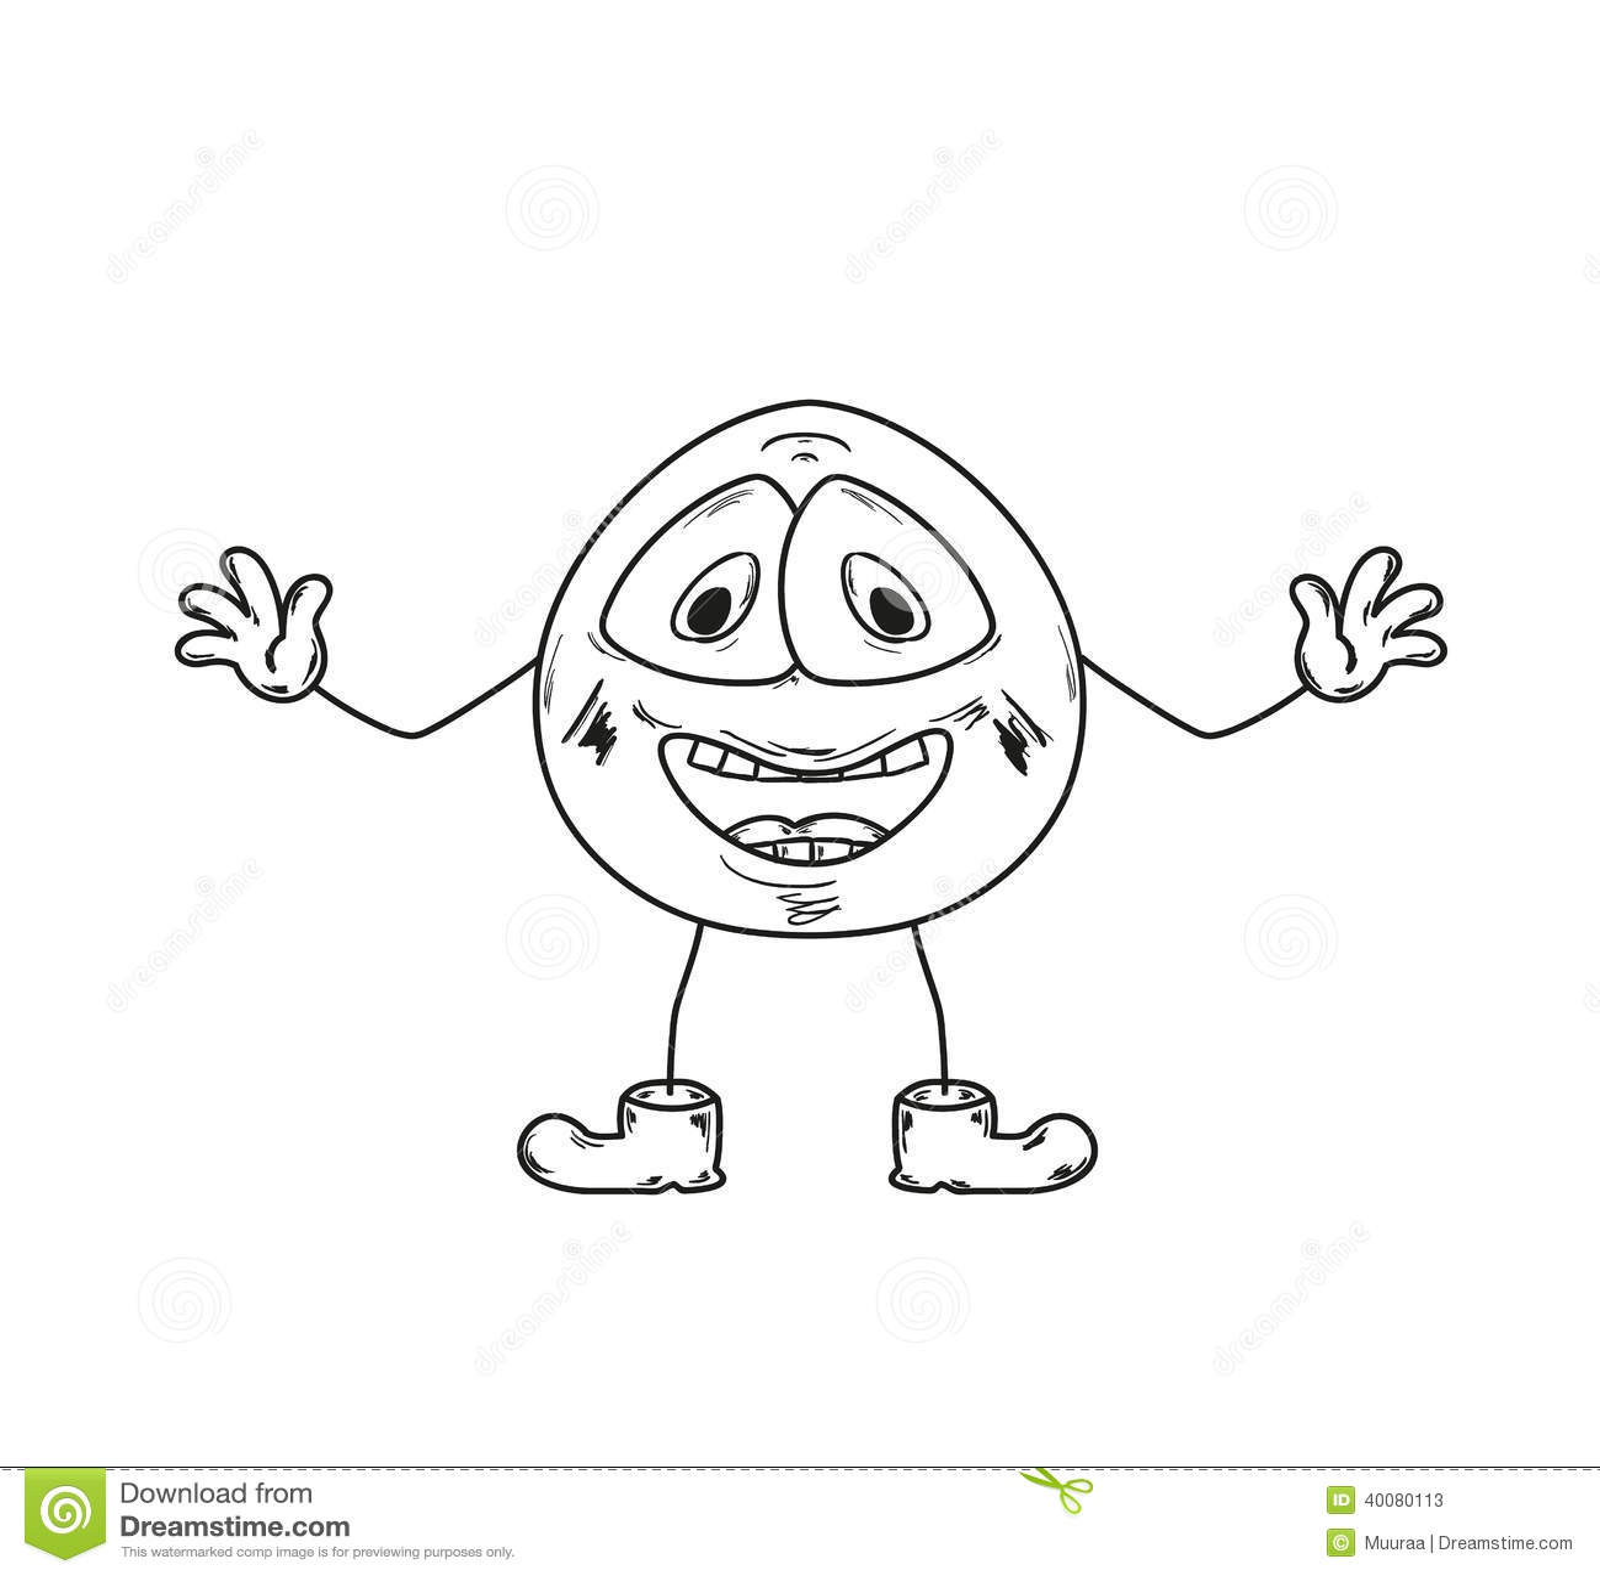 laugh emoticon sketch stock illustration image 40080113